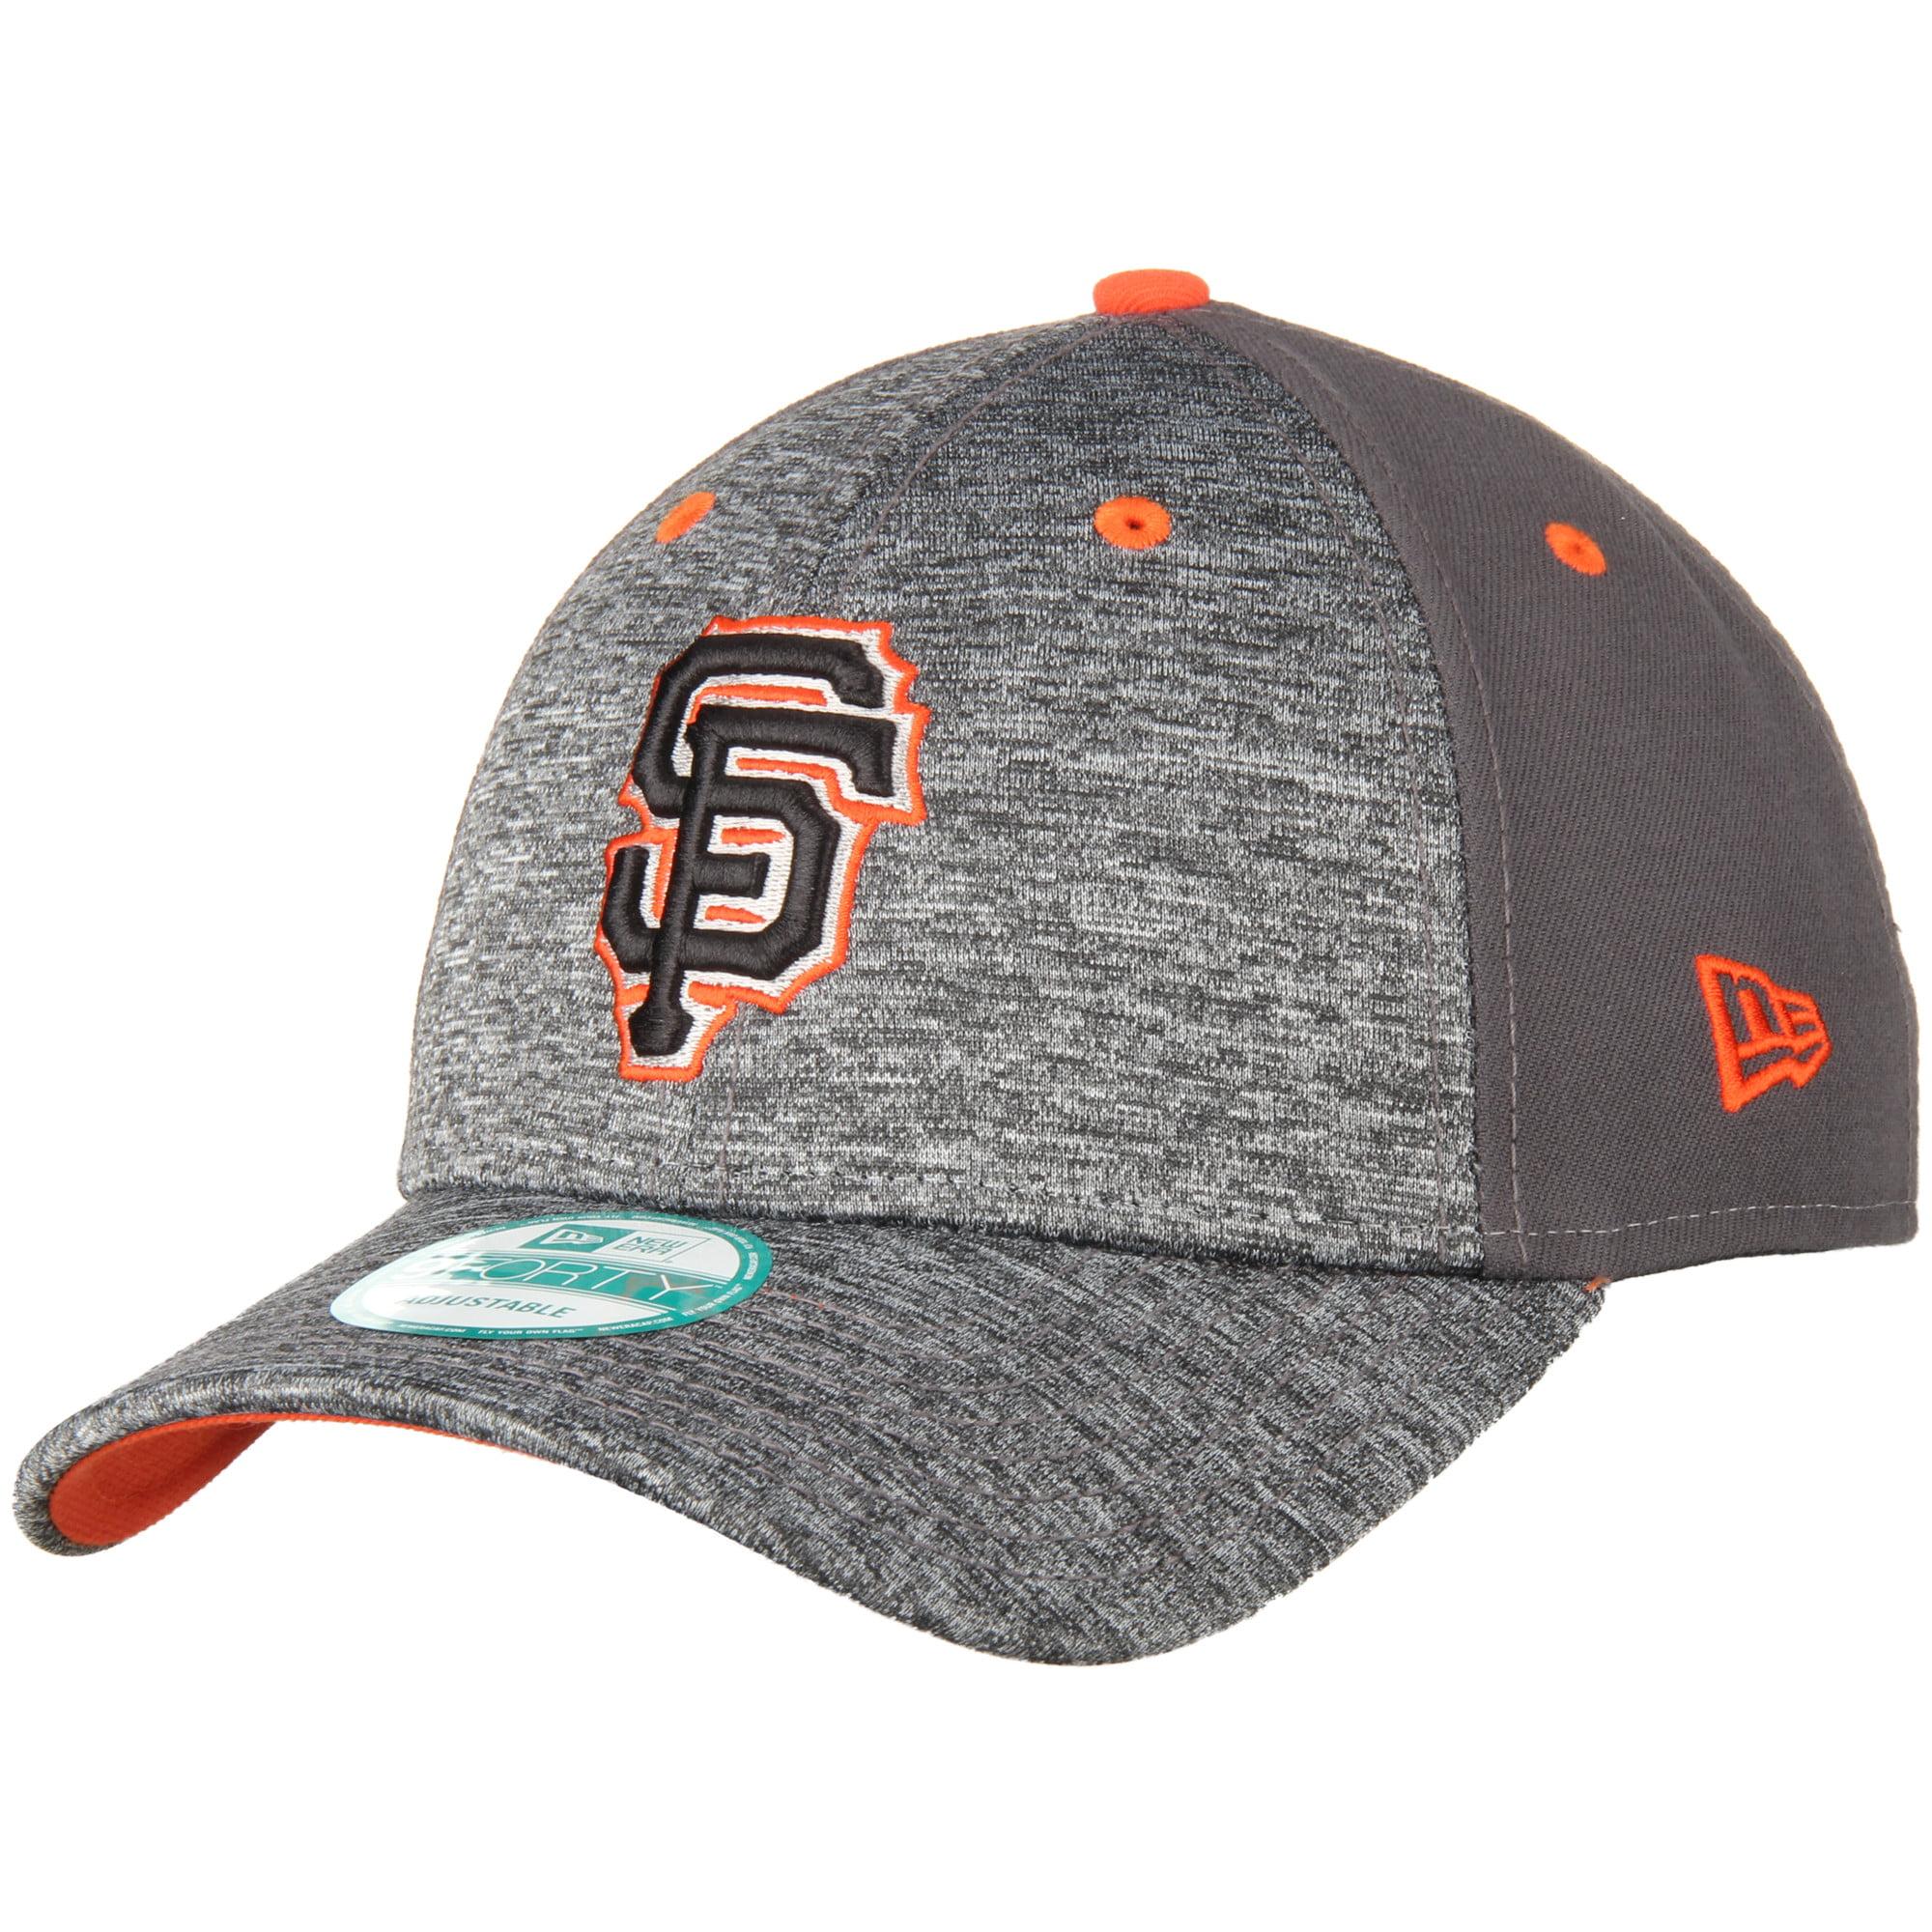 San Francisco Giants New Era The League Shadow 9FORTY Adjustable Hat - Heathered Gray - OSFA